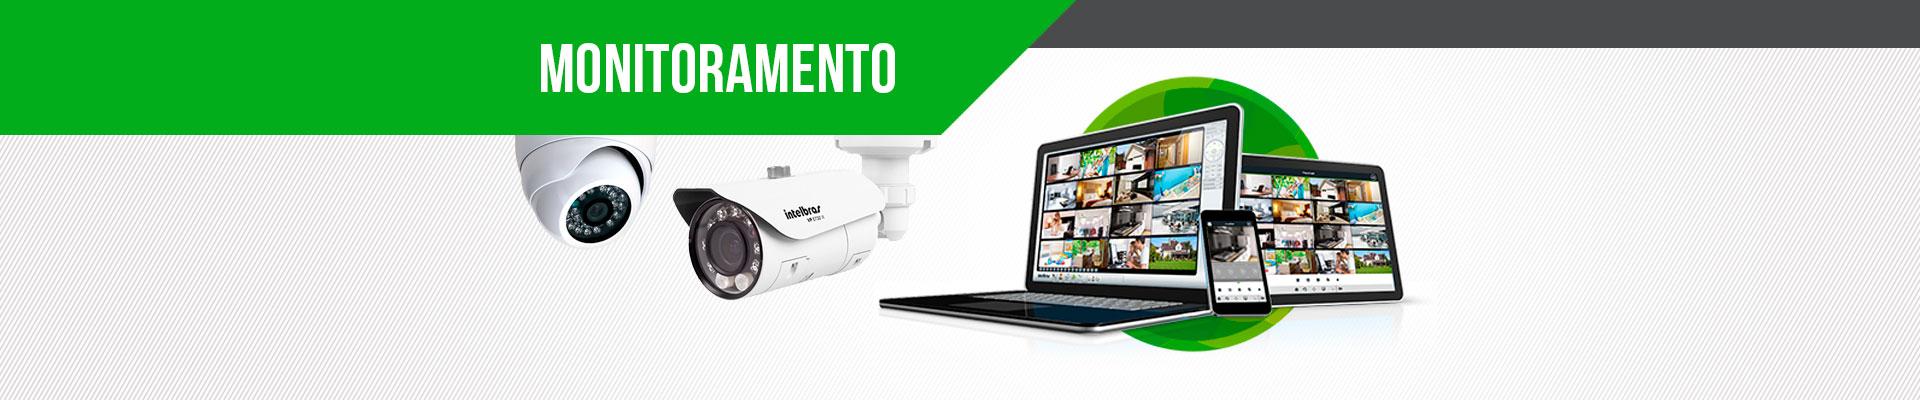 Monitoramento - Global Informática